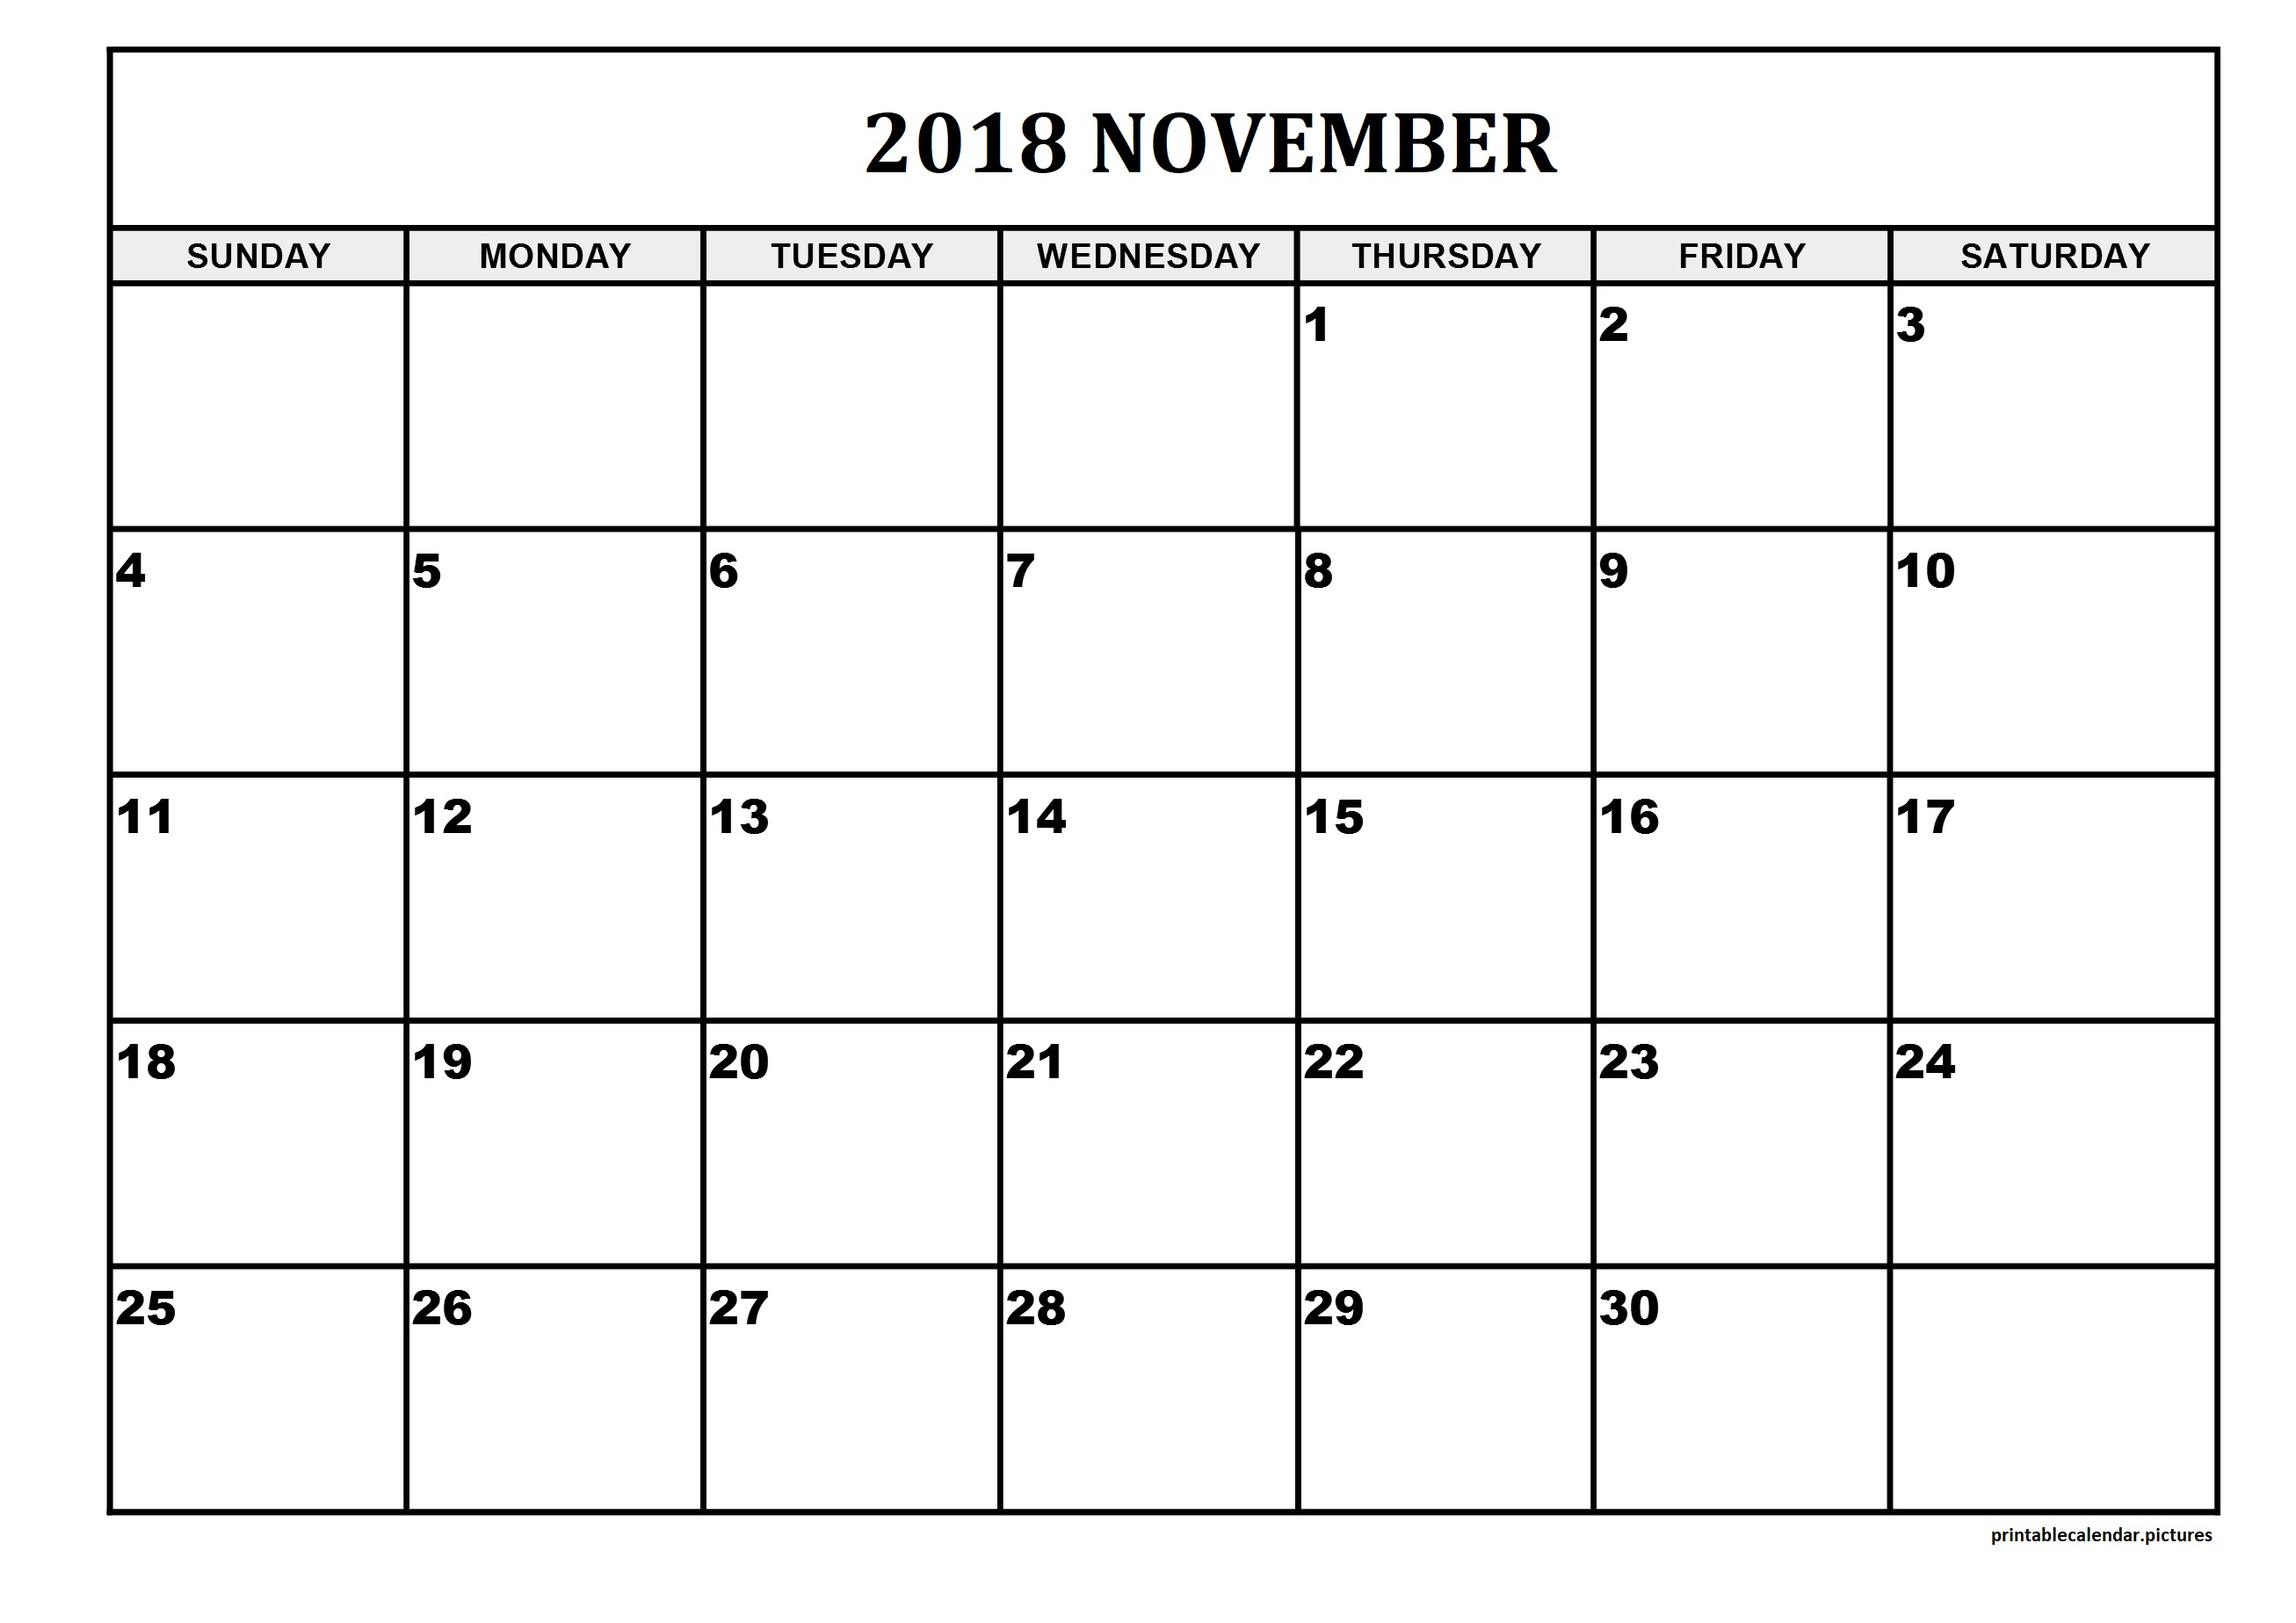 Printable Calendar Large Squares | Printable Calendar 2019